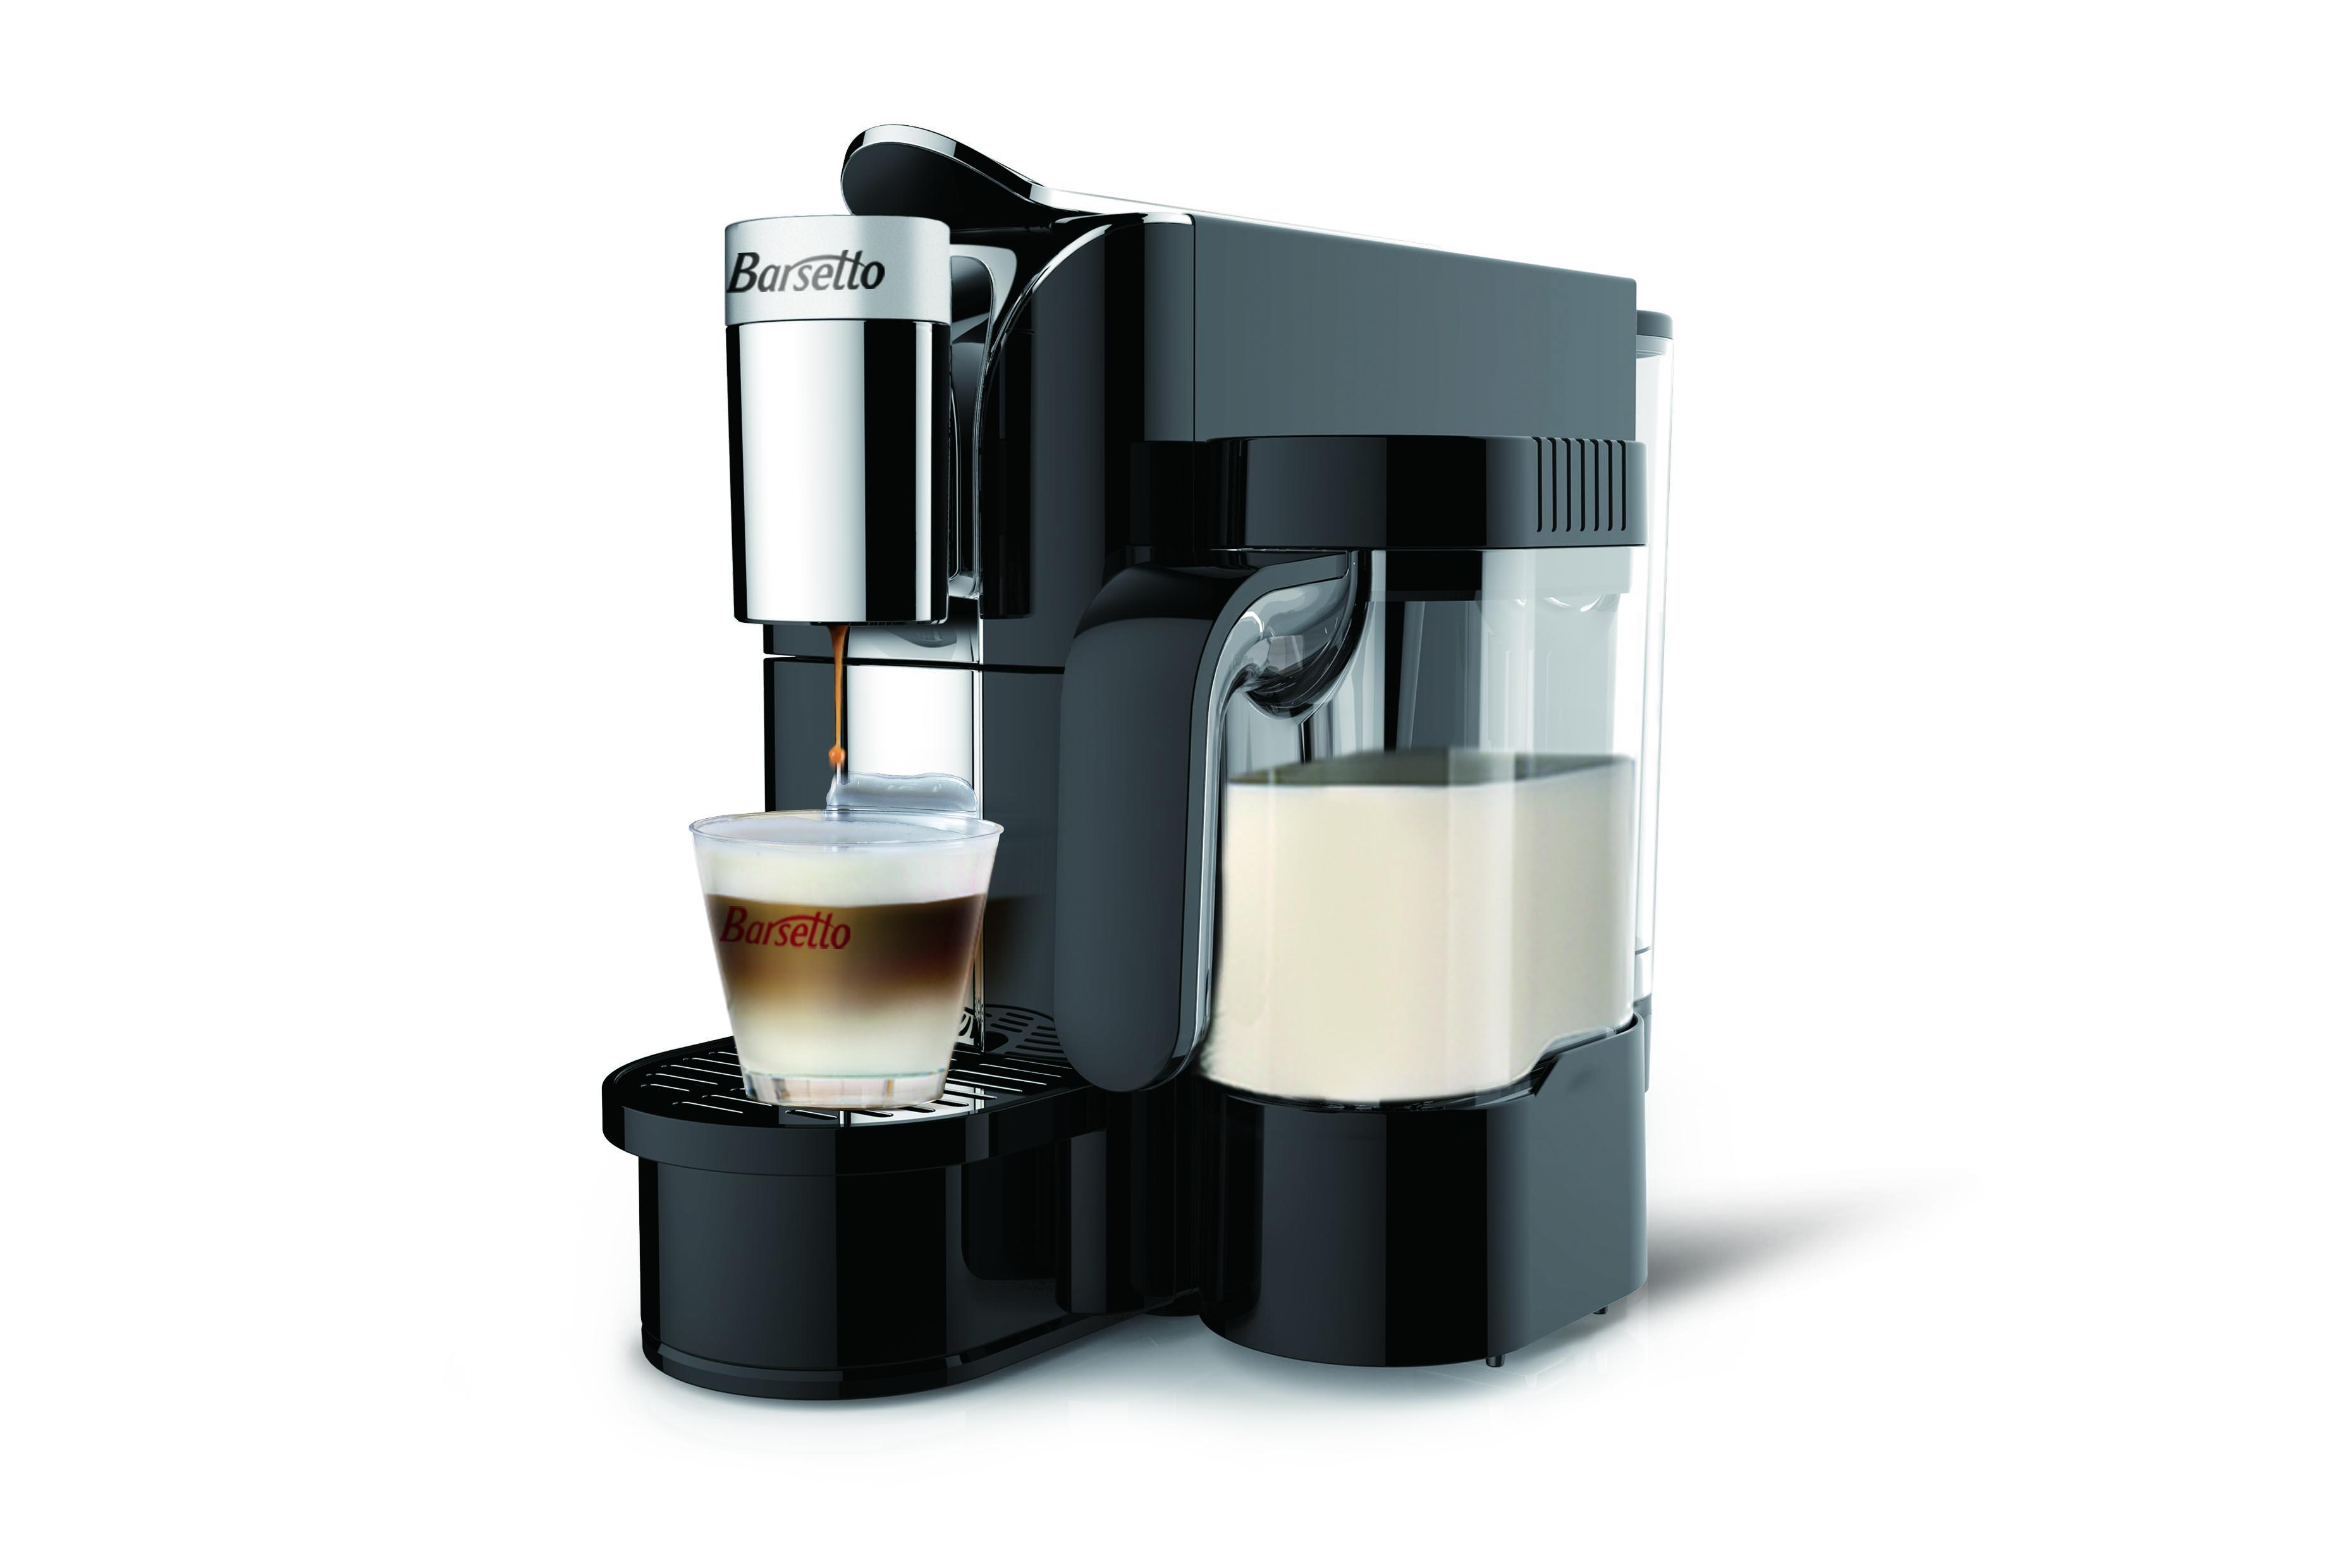 Barsetto 胶囊咖啡机 Handler Ⅱ BAC006A